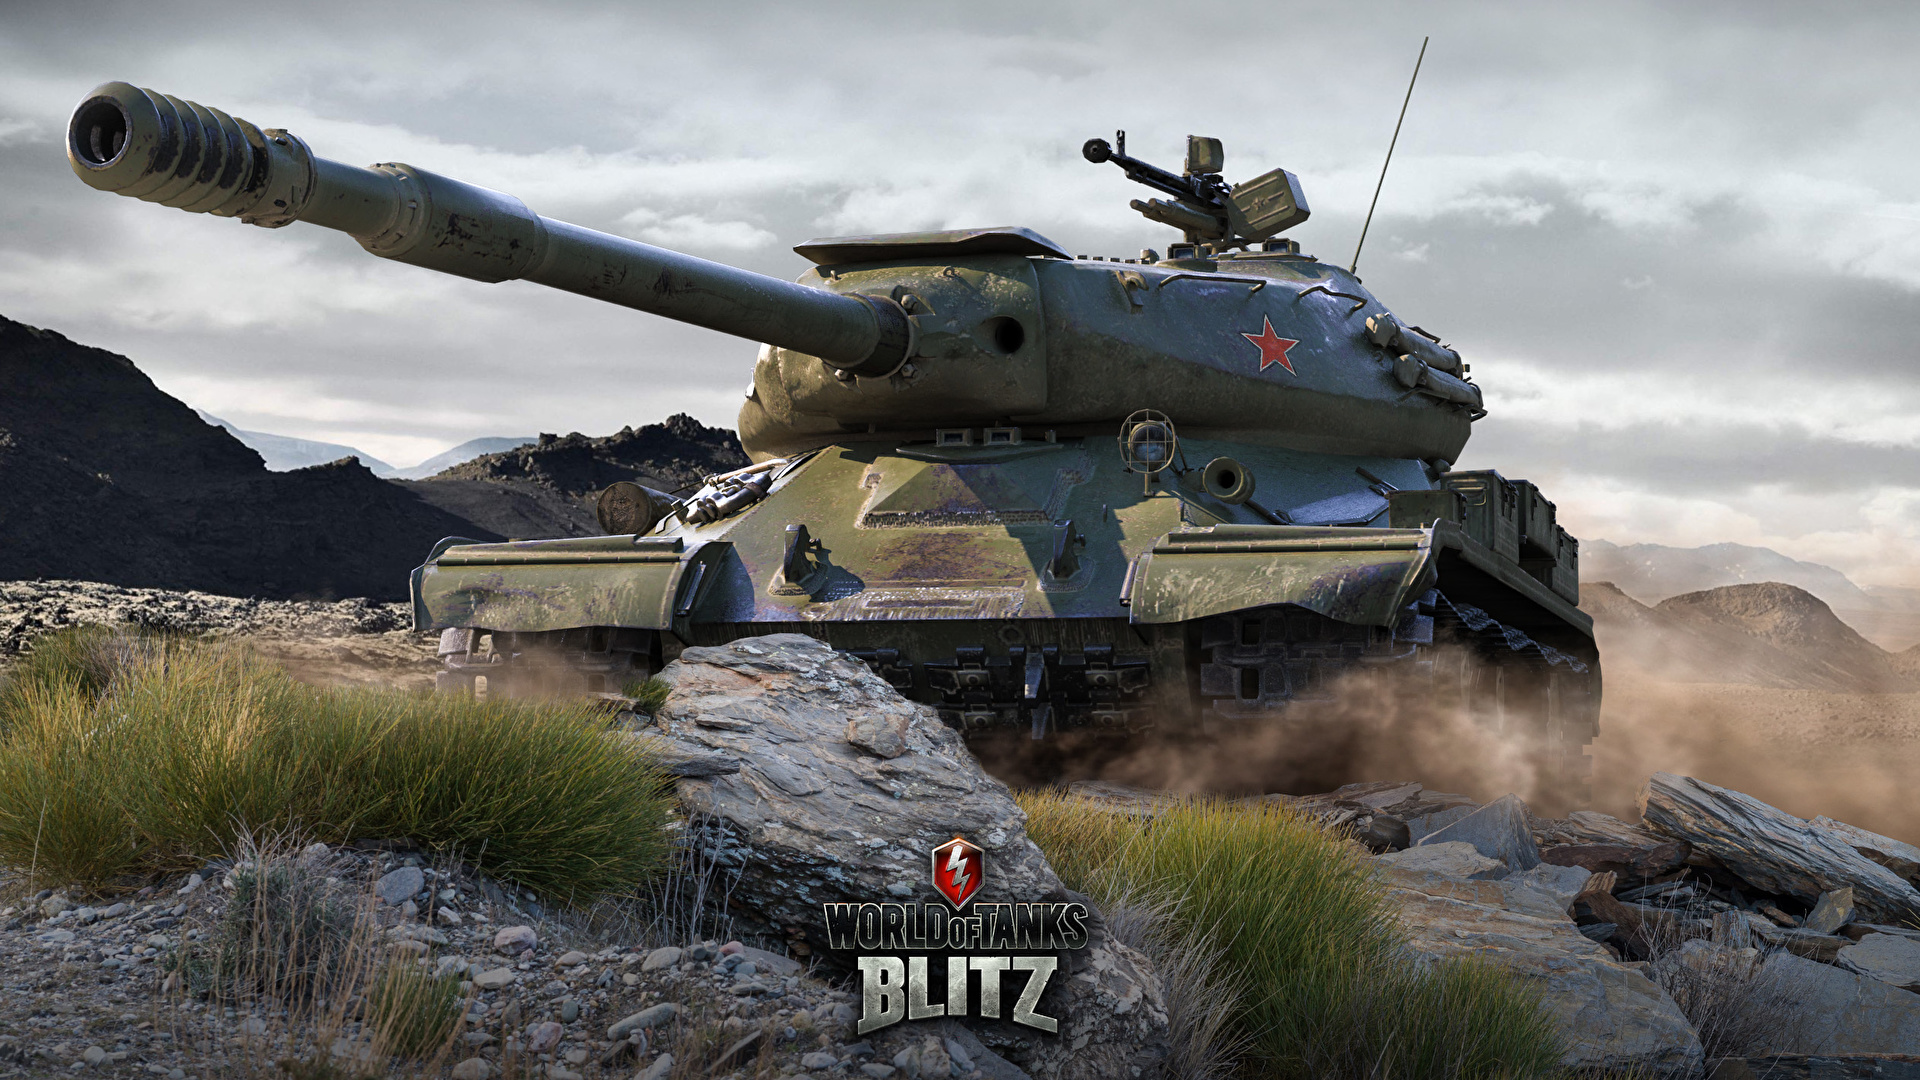 Desktop Wallpapers World Of Tanks Tank Russian Blitz Is 4 1920x1080